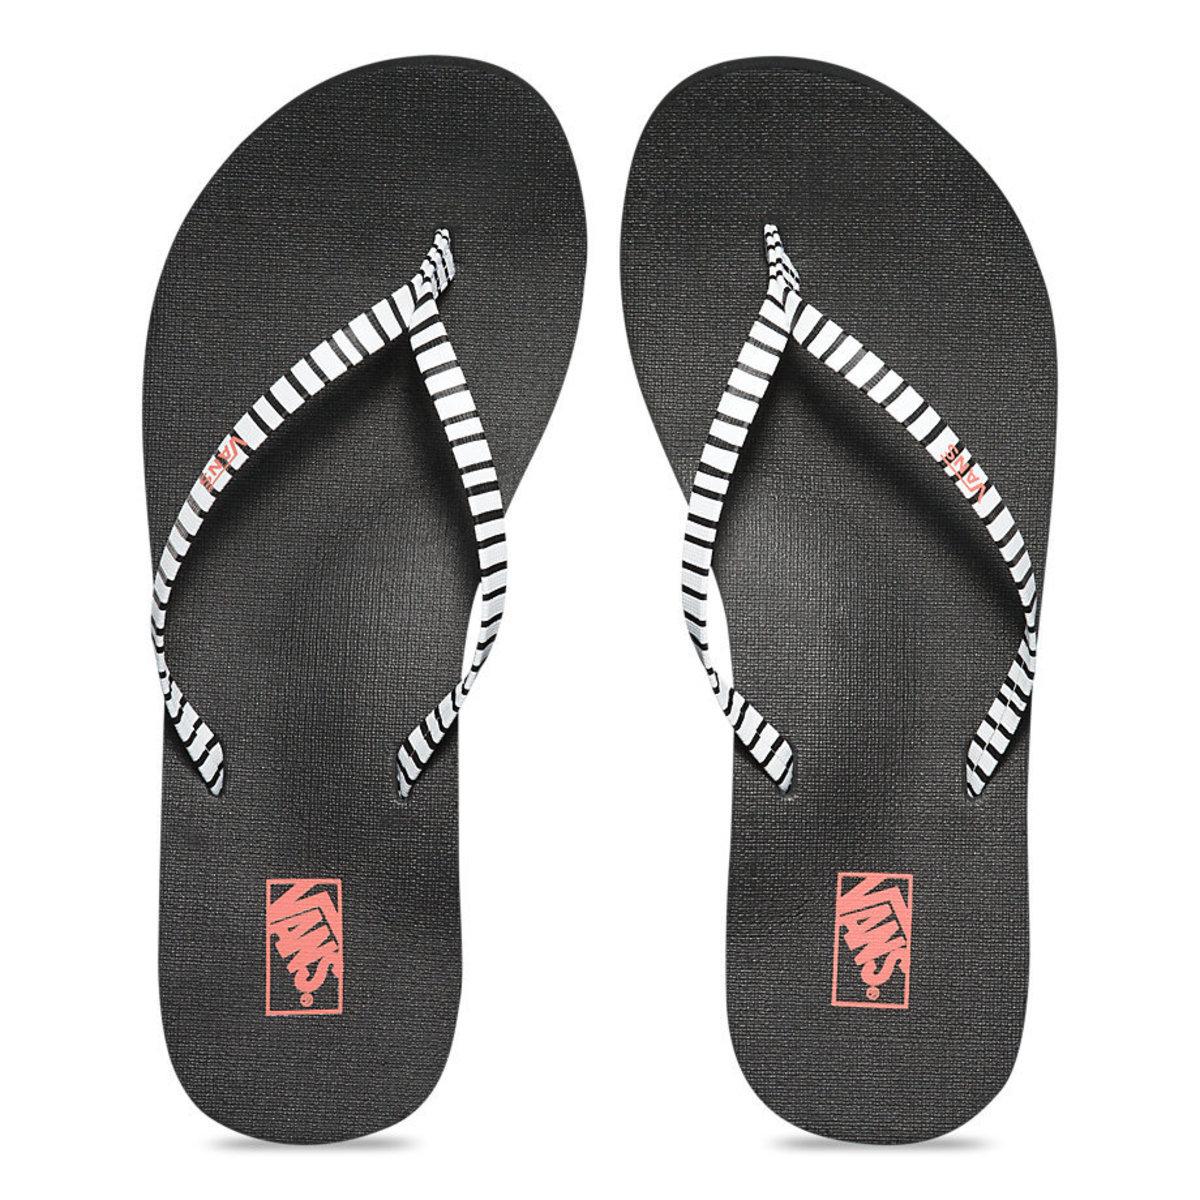 sandály dámské VANS - Malta Print - Just Stripes - Black/White - VZUCIF6